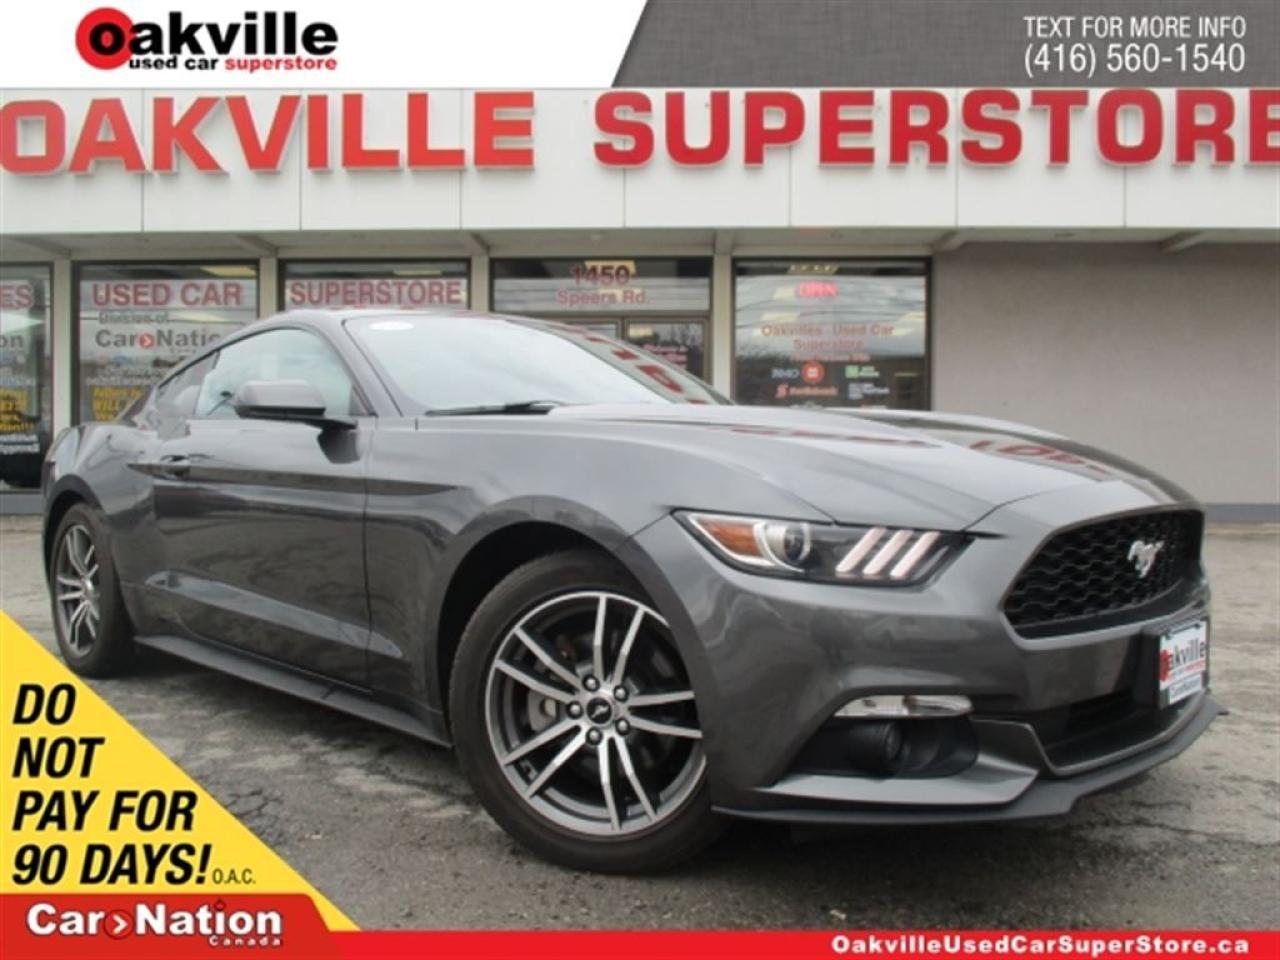 Used Cars In Oakville For Sale Adanih Com